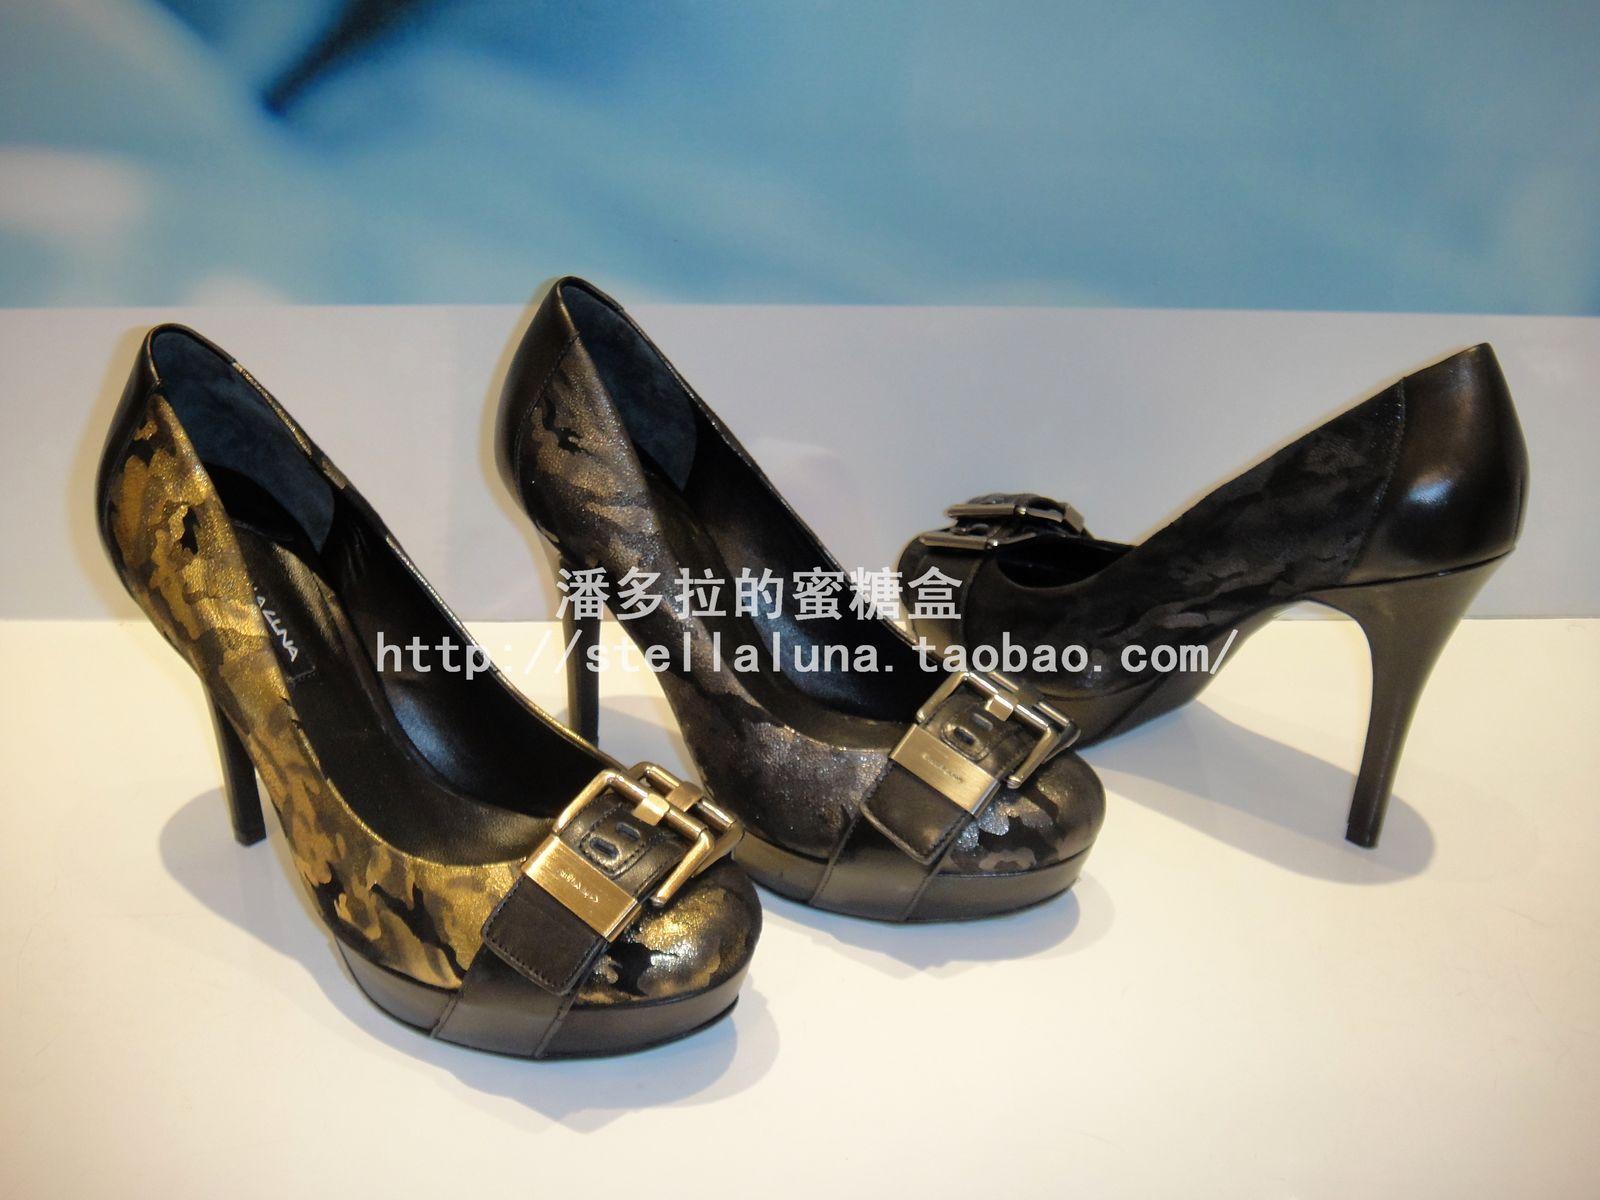 все цены на туфли Stella luna slp11a242 STELLALUNA 2011 онлайн